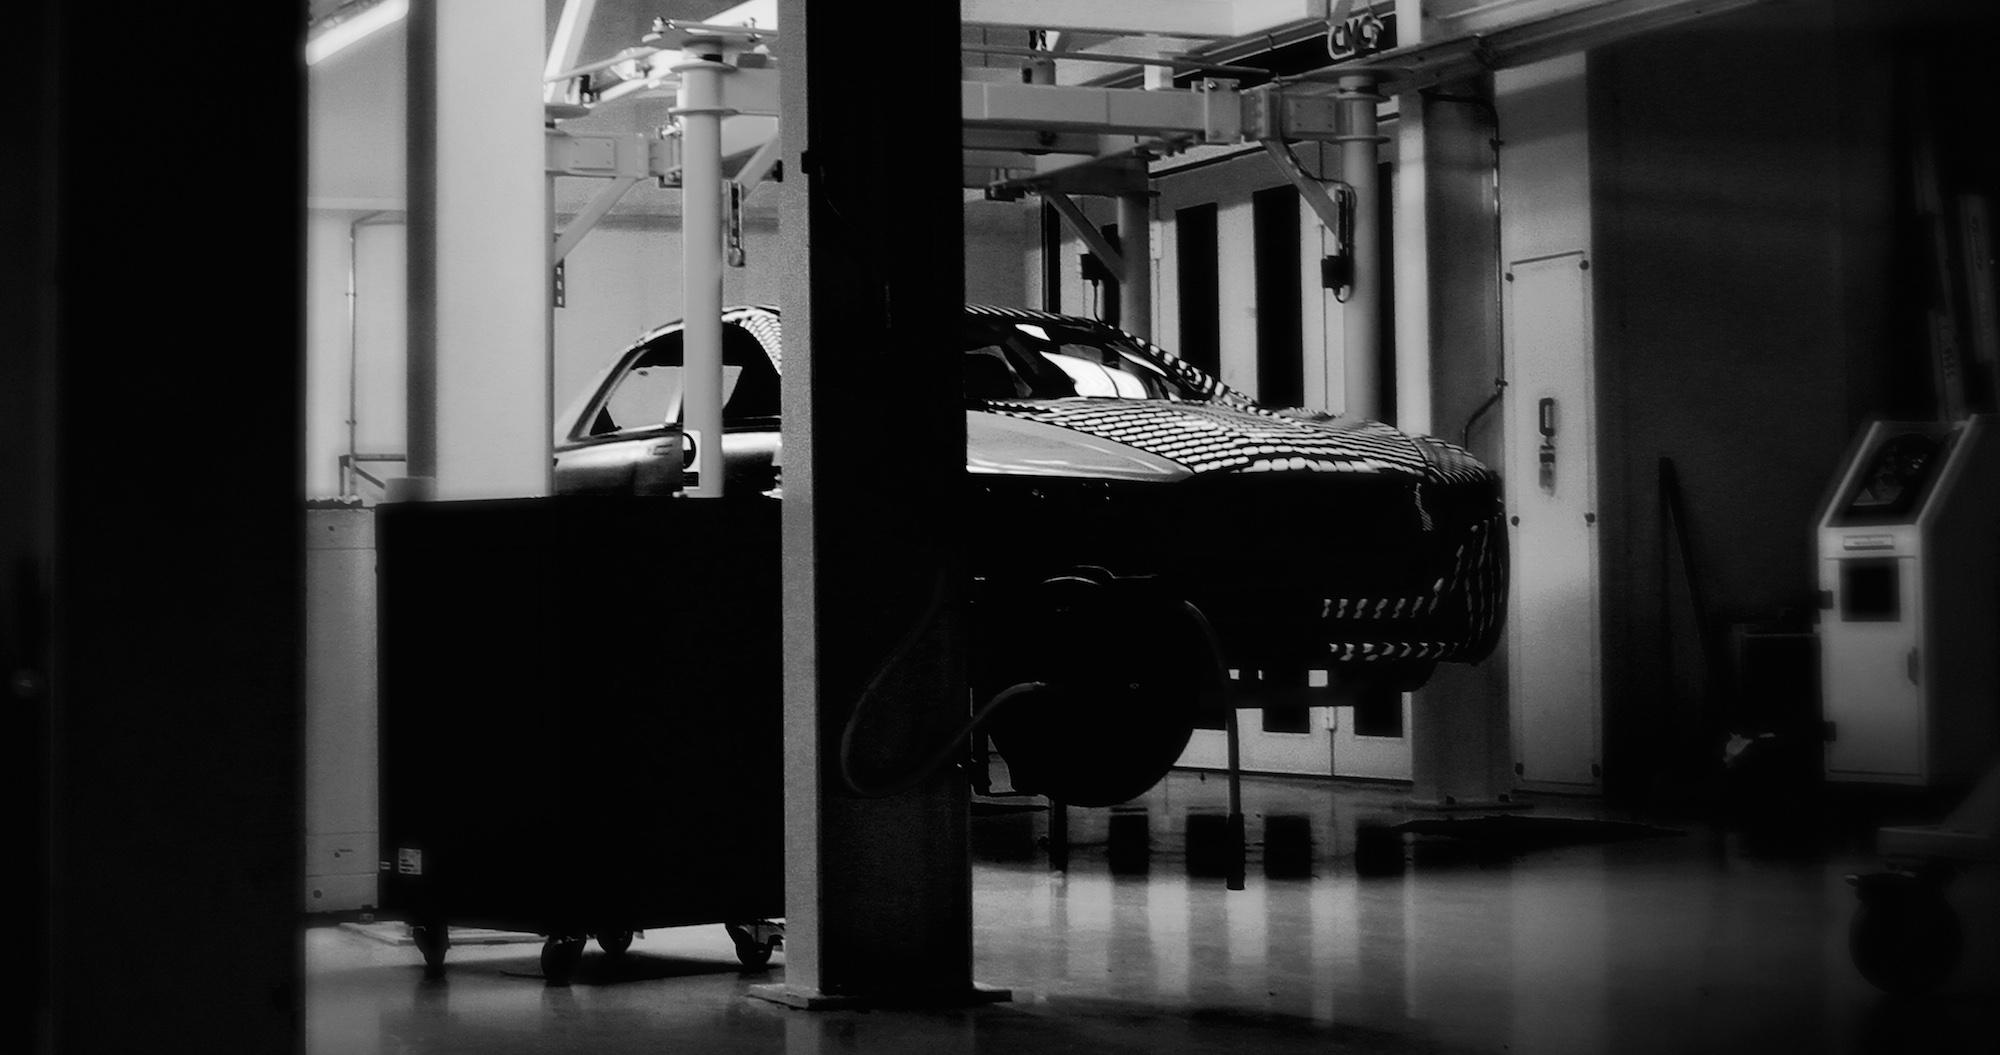 2015 Ford Mustang F35, Aston Martin Lagonda, Toyota Supra Details: Today's Car News